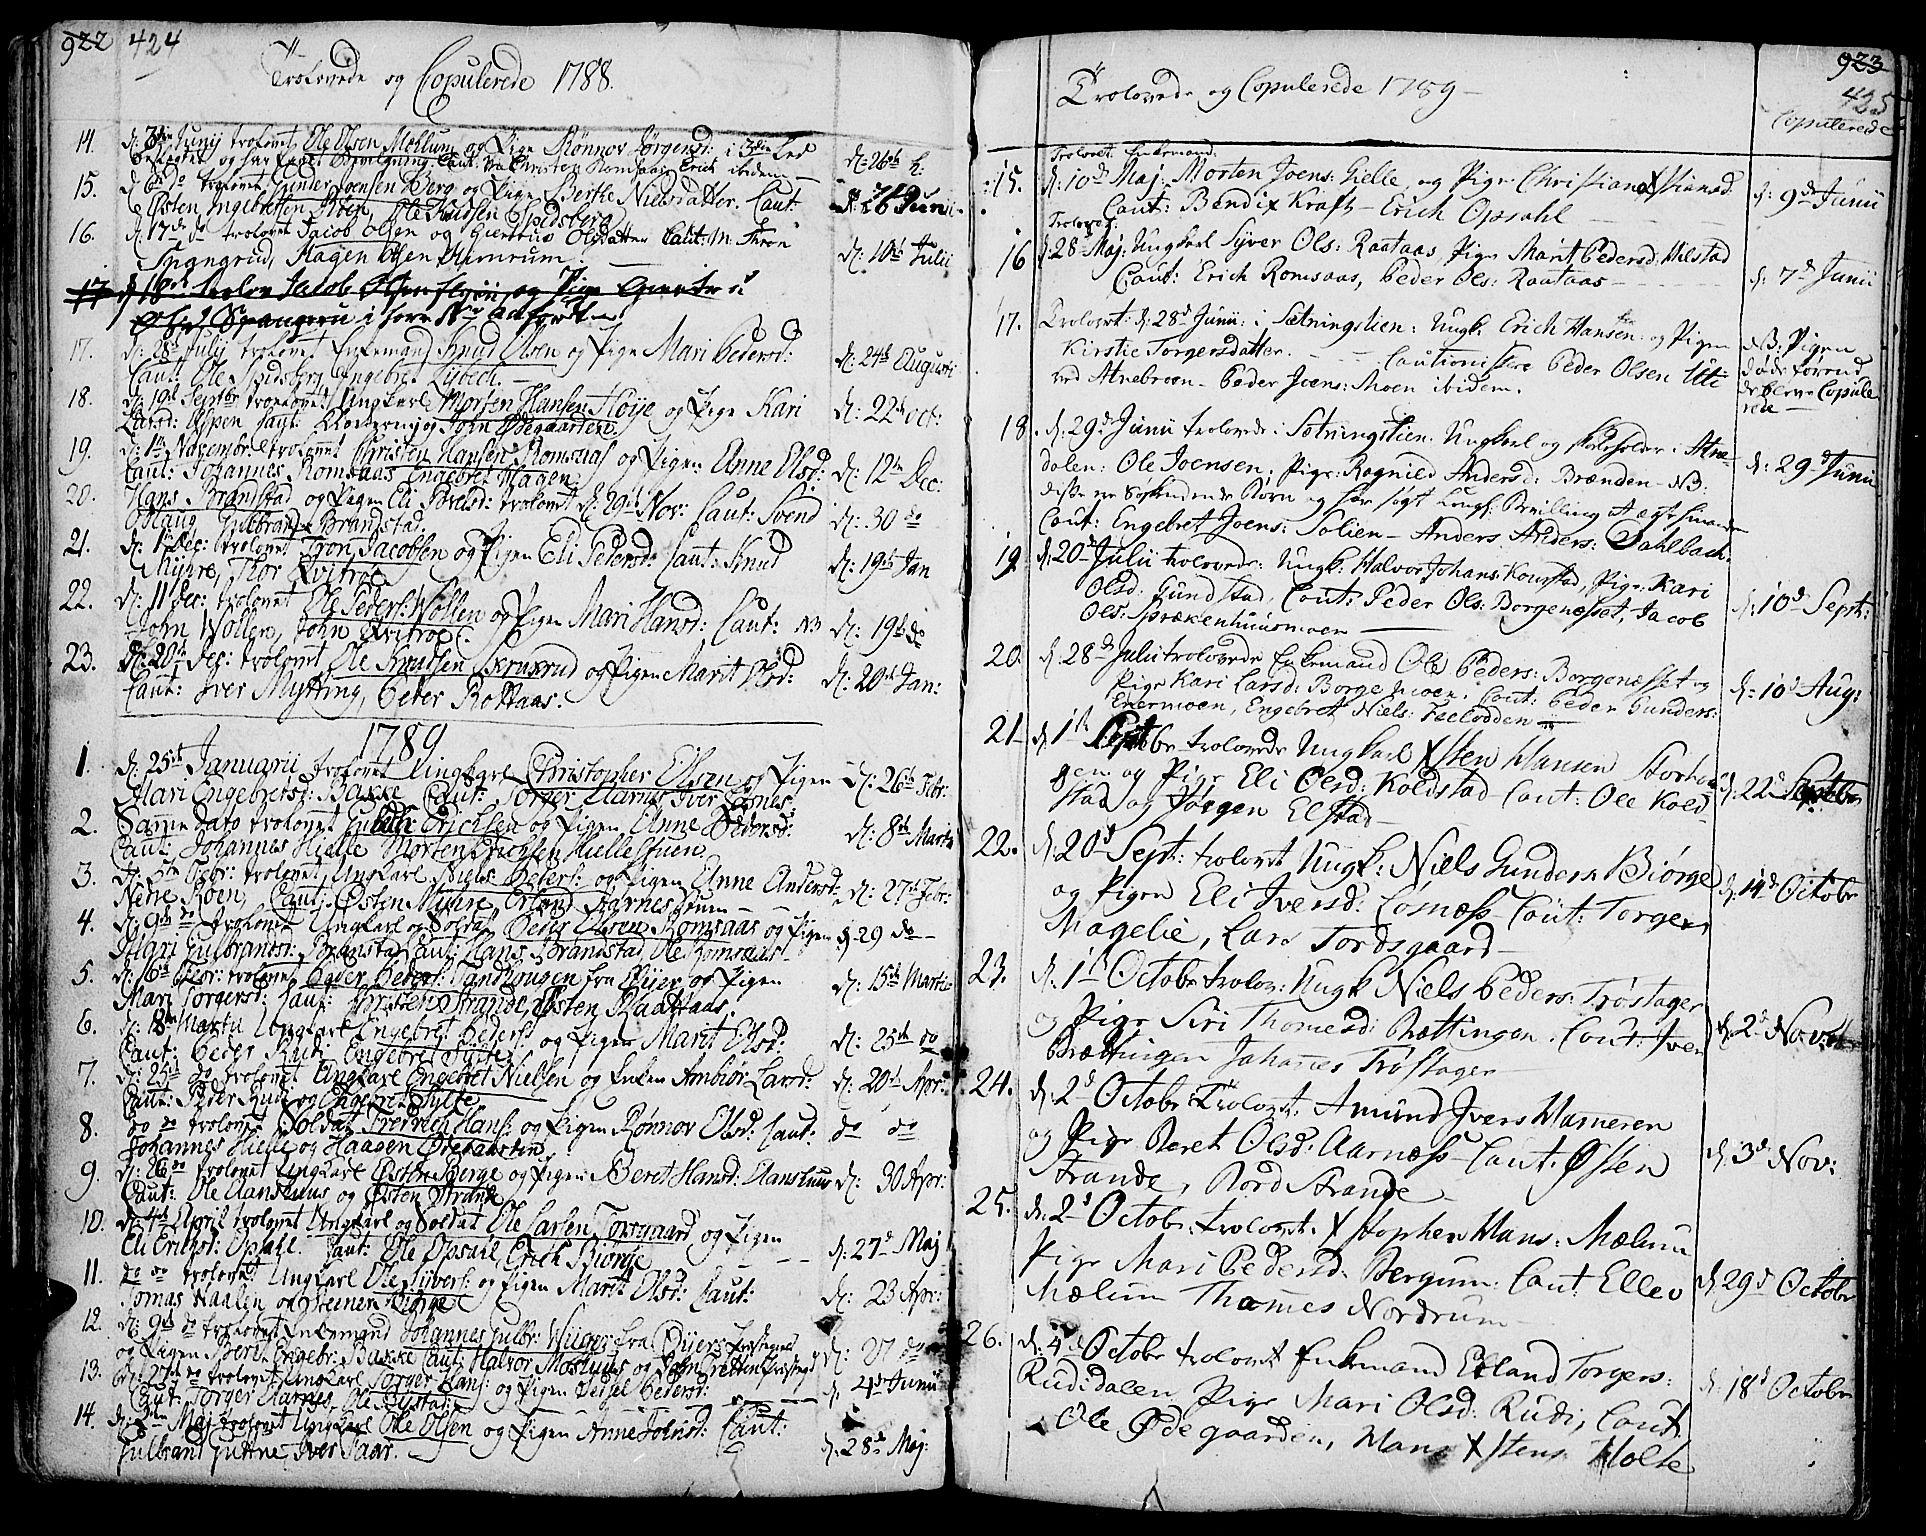 SAH, Ringebu prestekontor, Ministerialbok nr. 3, 1781-1820, s. 424-425